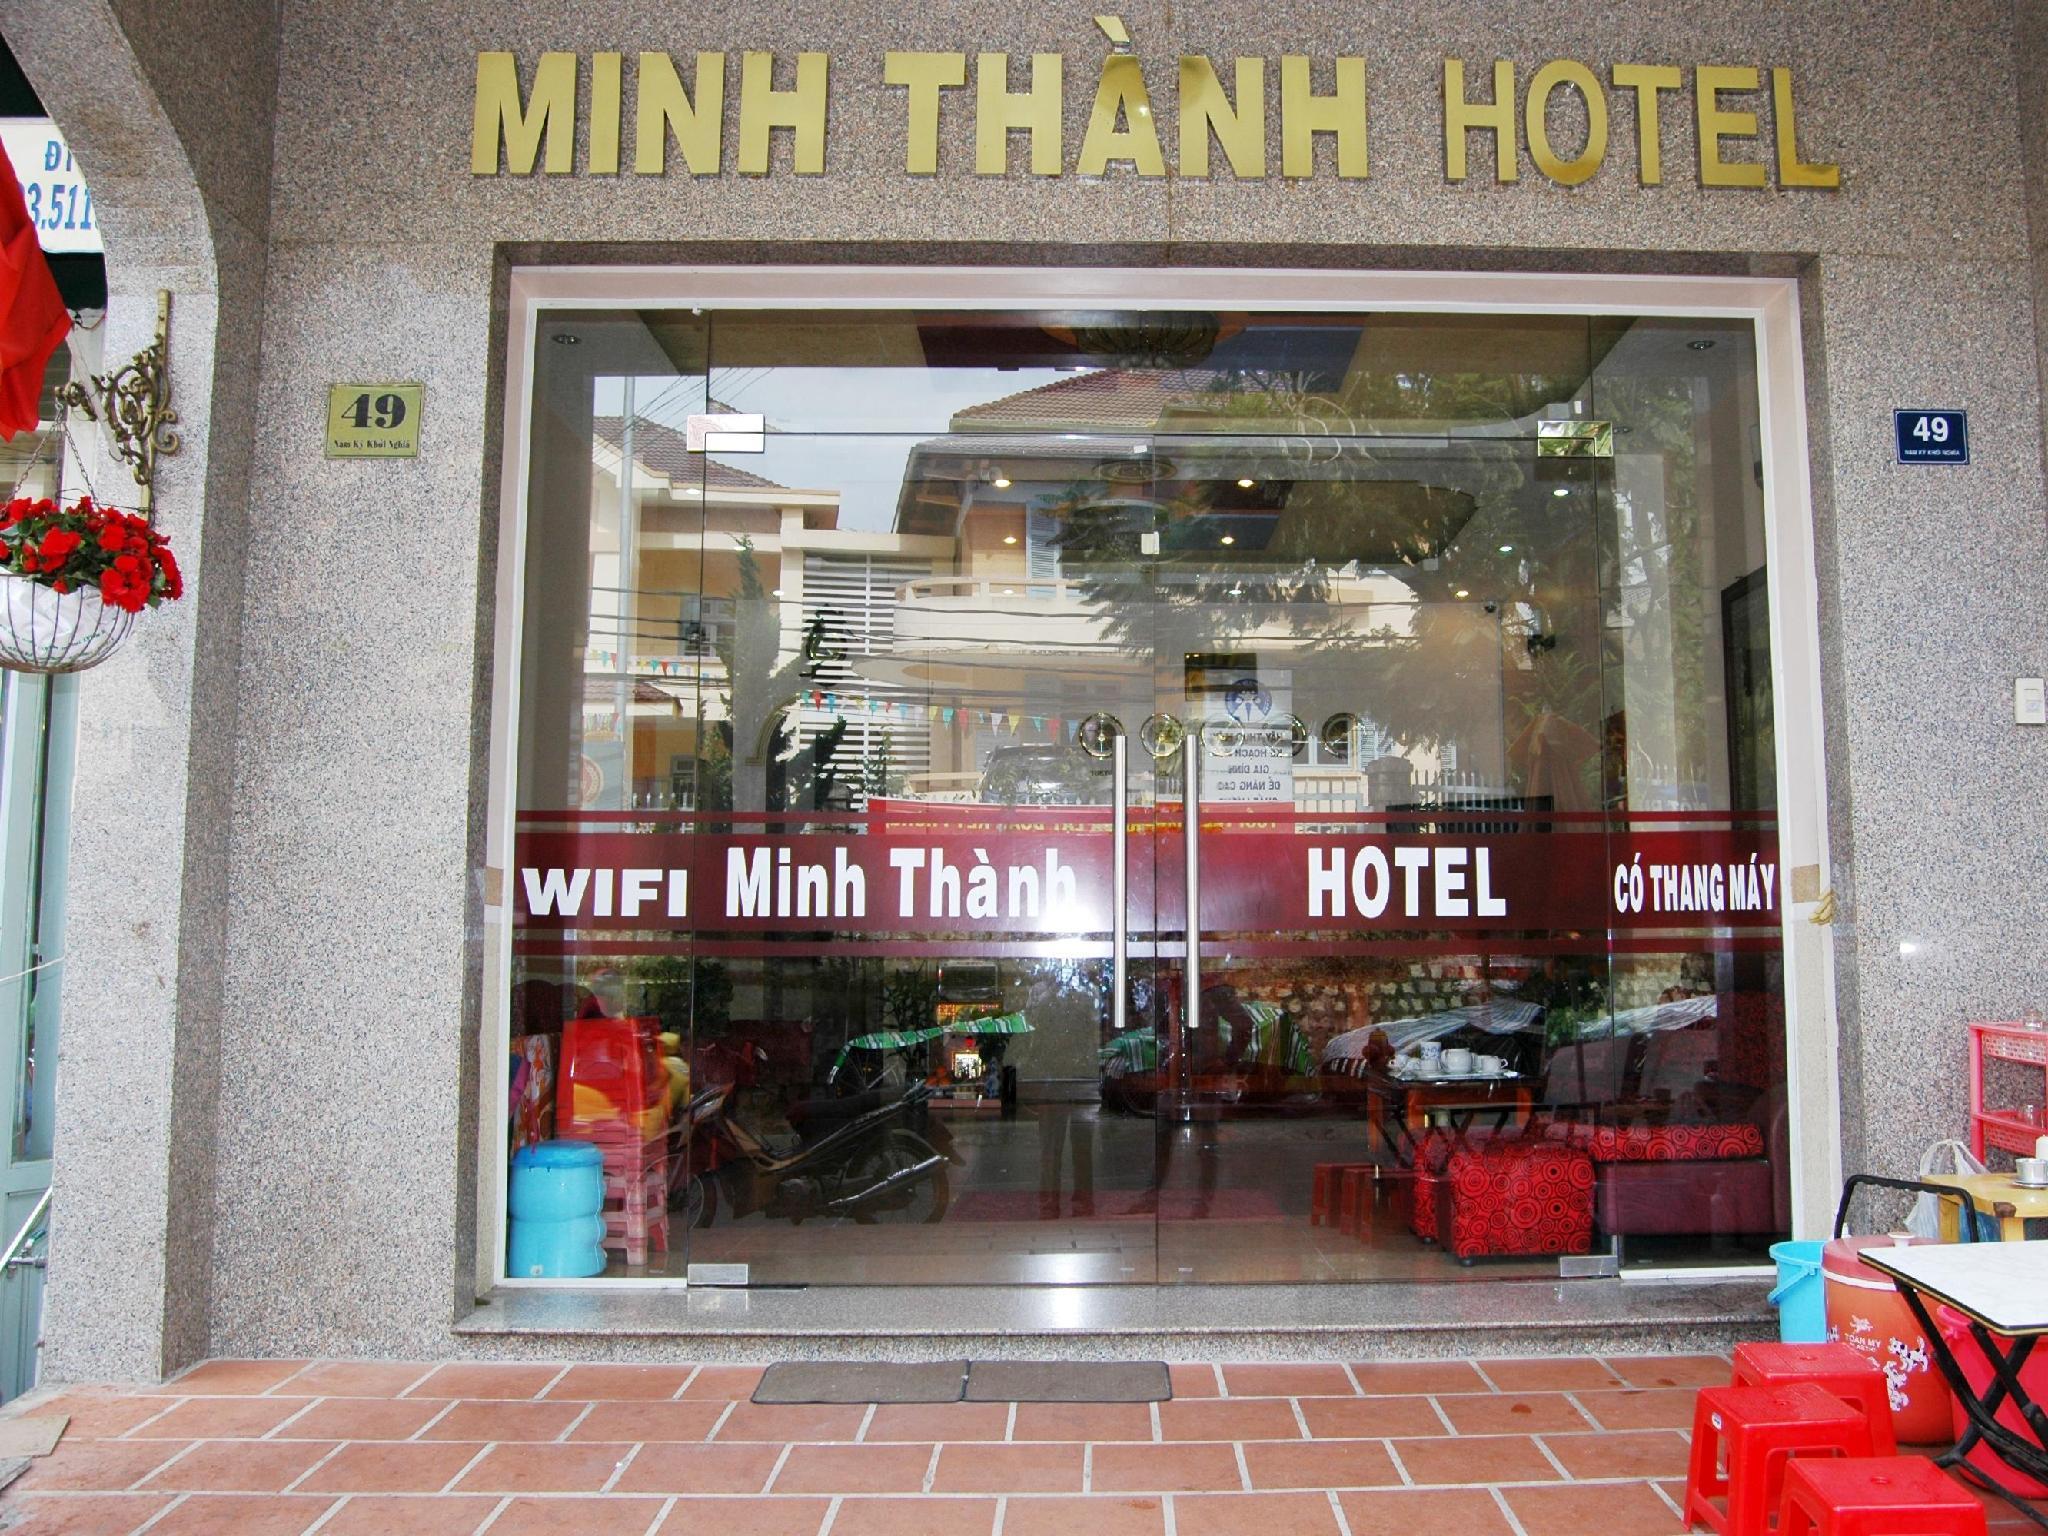 Minh Thanh Hotel